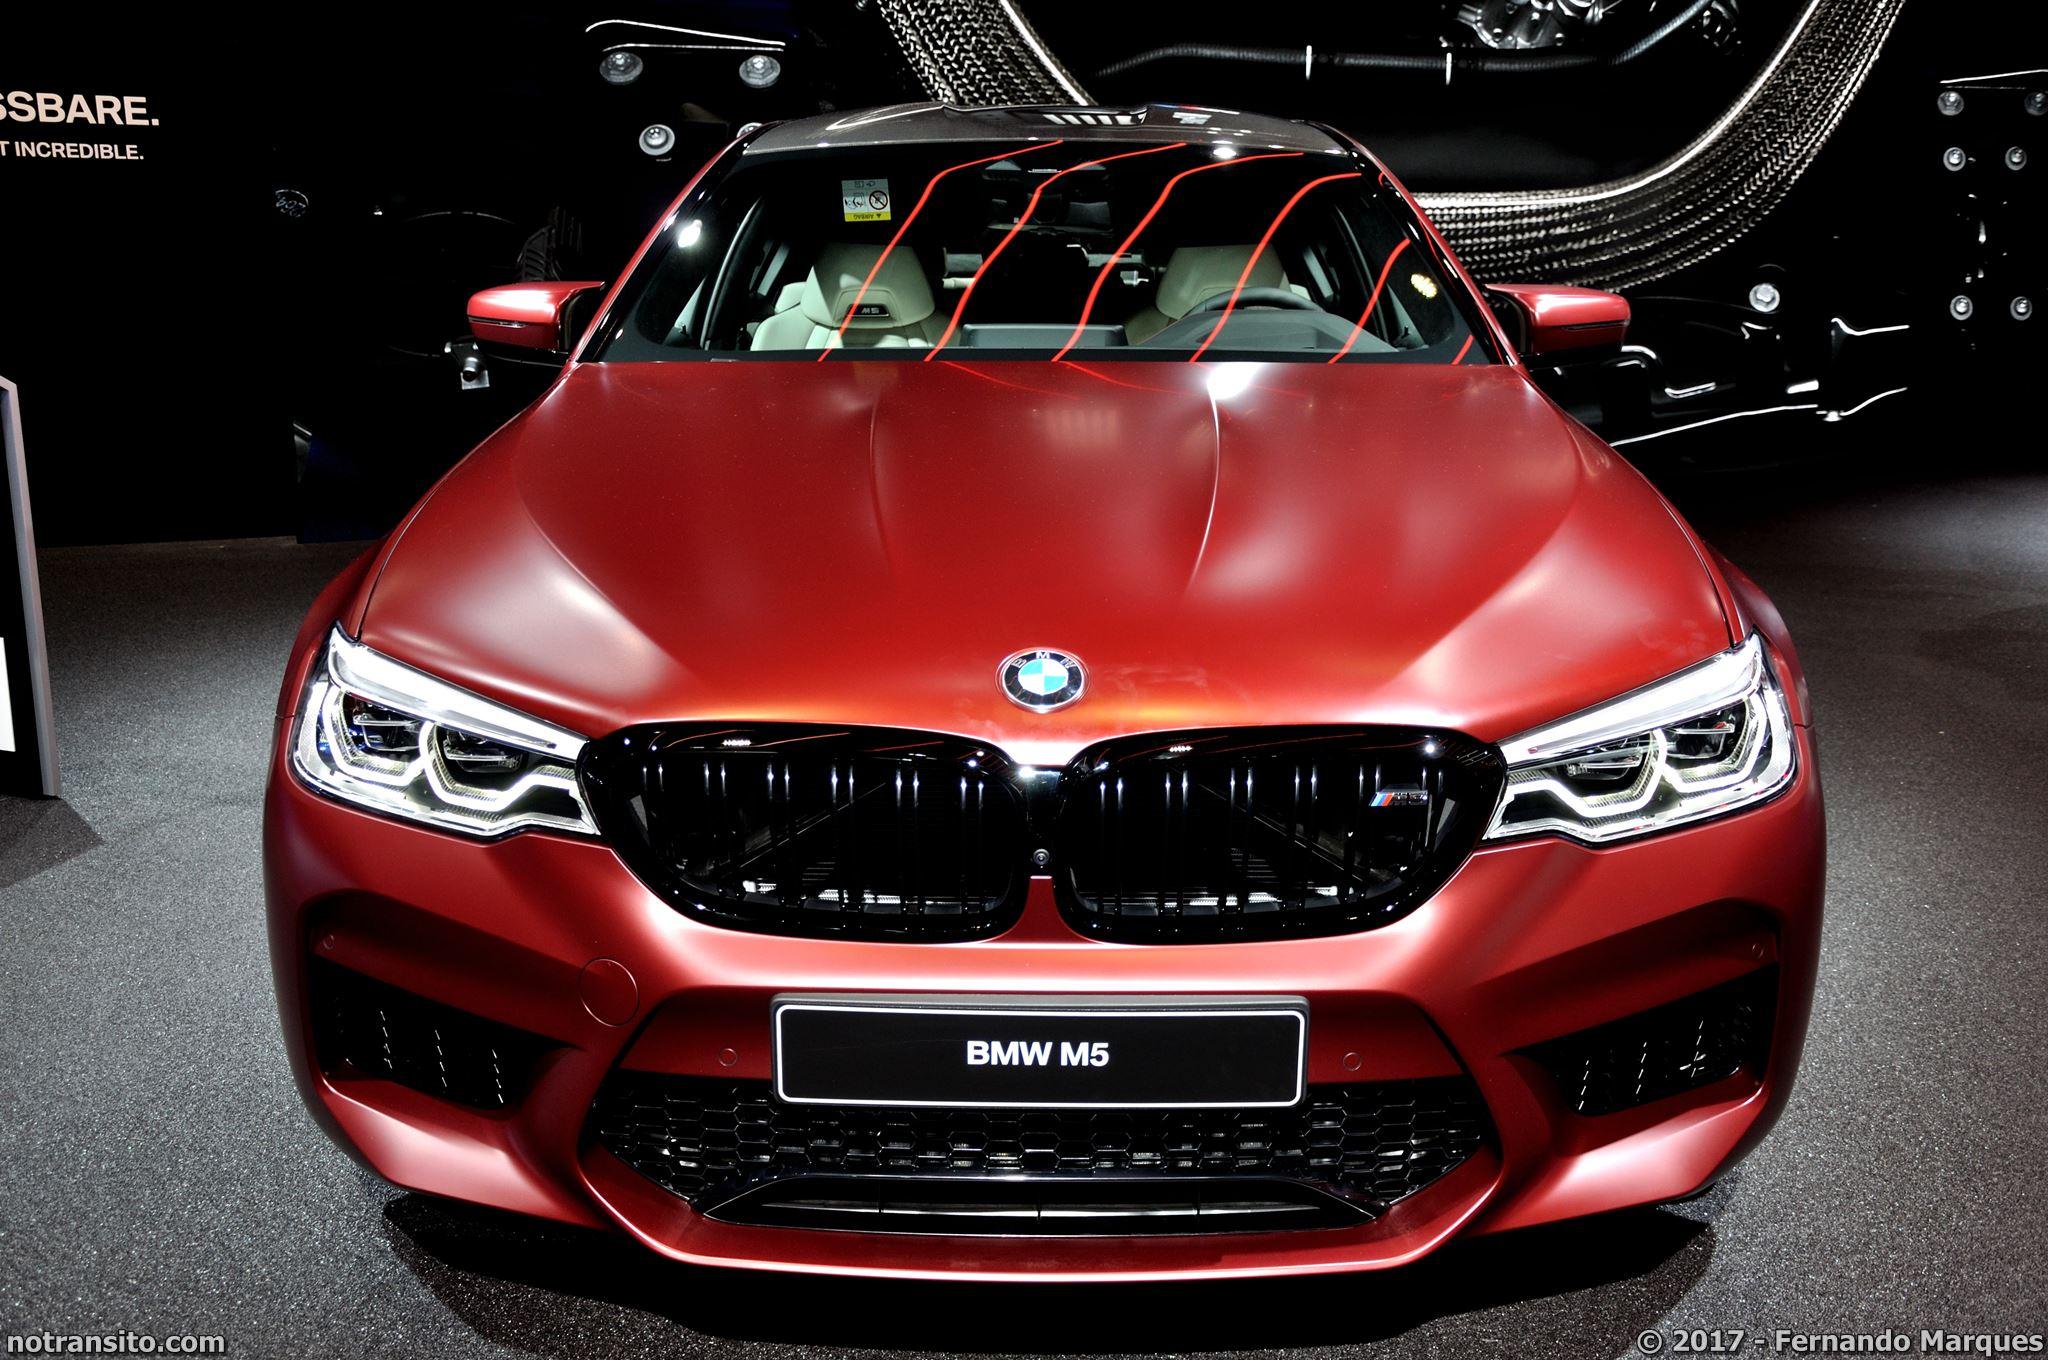 BMW M5 F90 First Edition Frankfurt